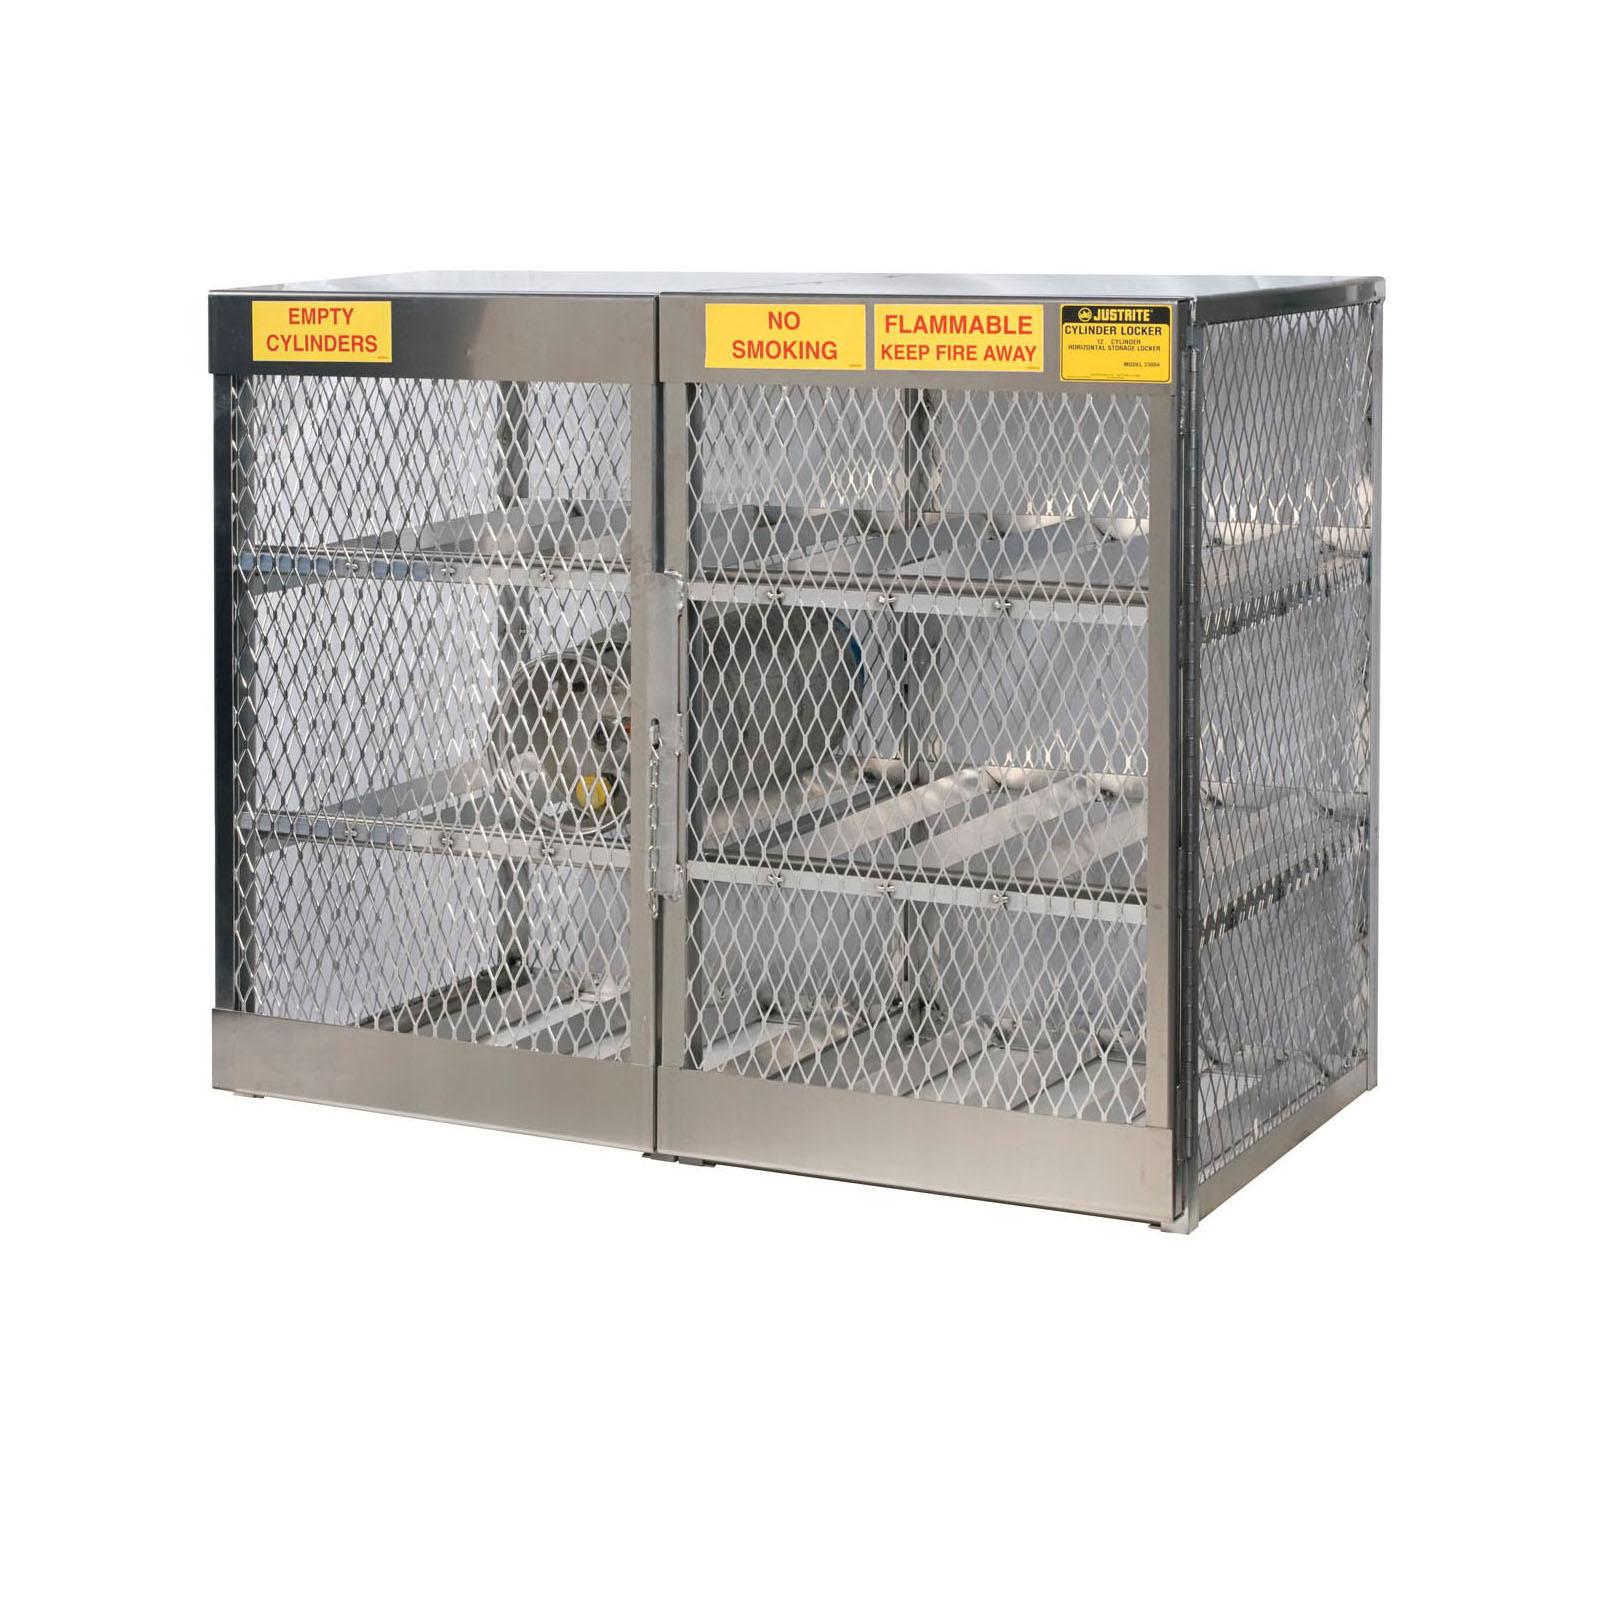 Justrite® 23004 Horizontal LPG Cylinder Locker, (12) 20 lb/33 lb, 49-1/2 in H x 60 in W x 32 in D, Aluminum Roof, Welded Aluminum, Aluminum